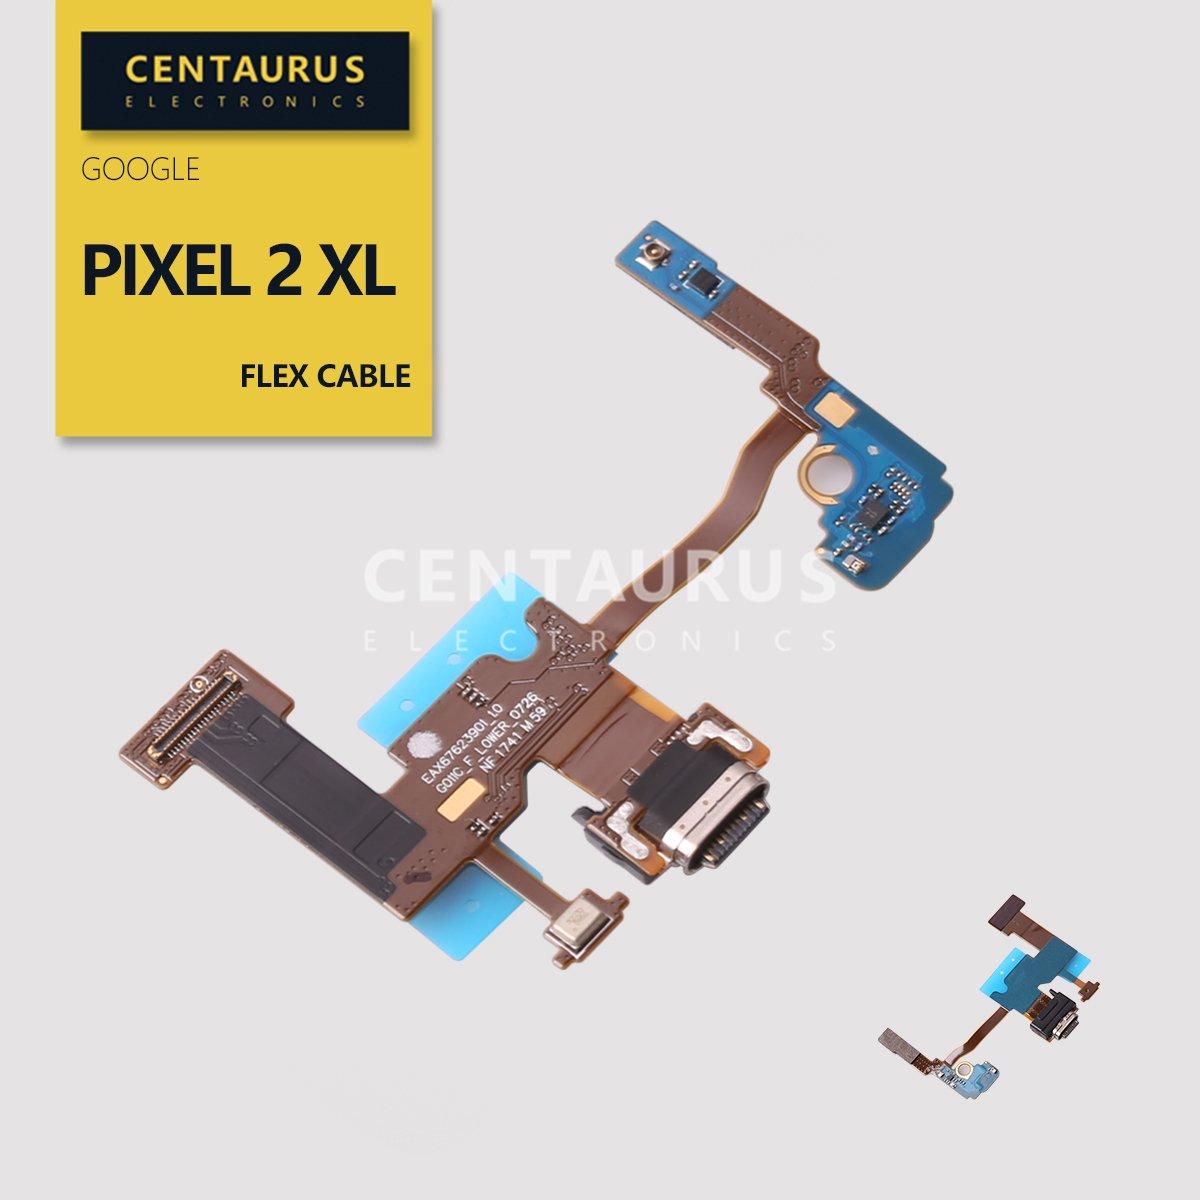 Puerto de Carga para Google Pixel 2 XL G011C 6.0 CENTAURUS